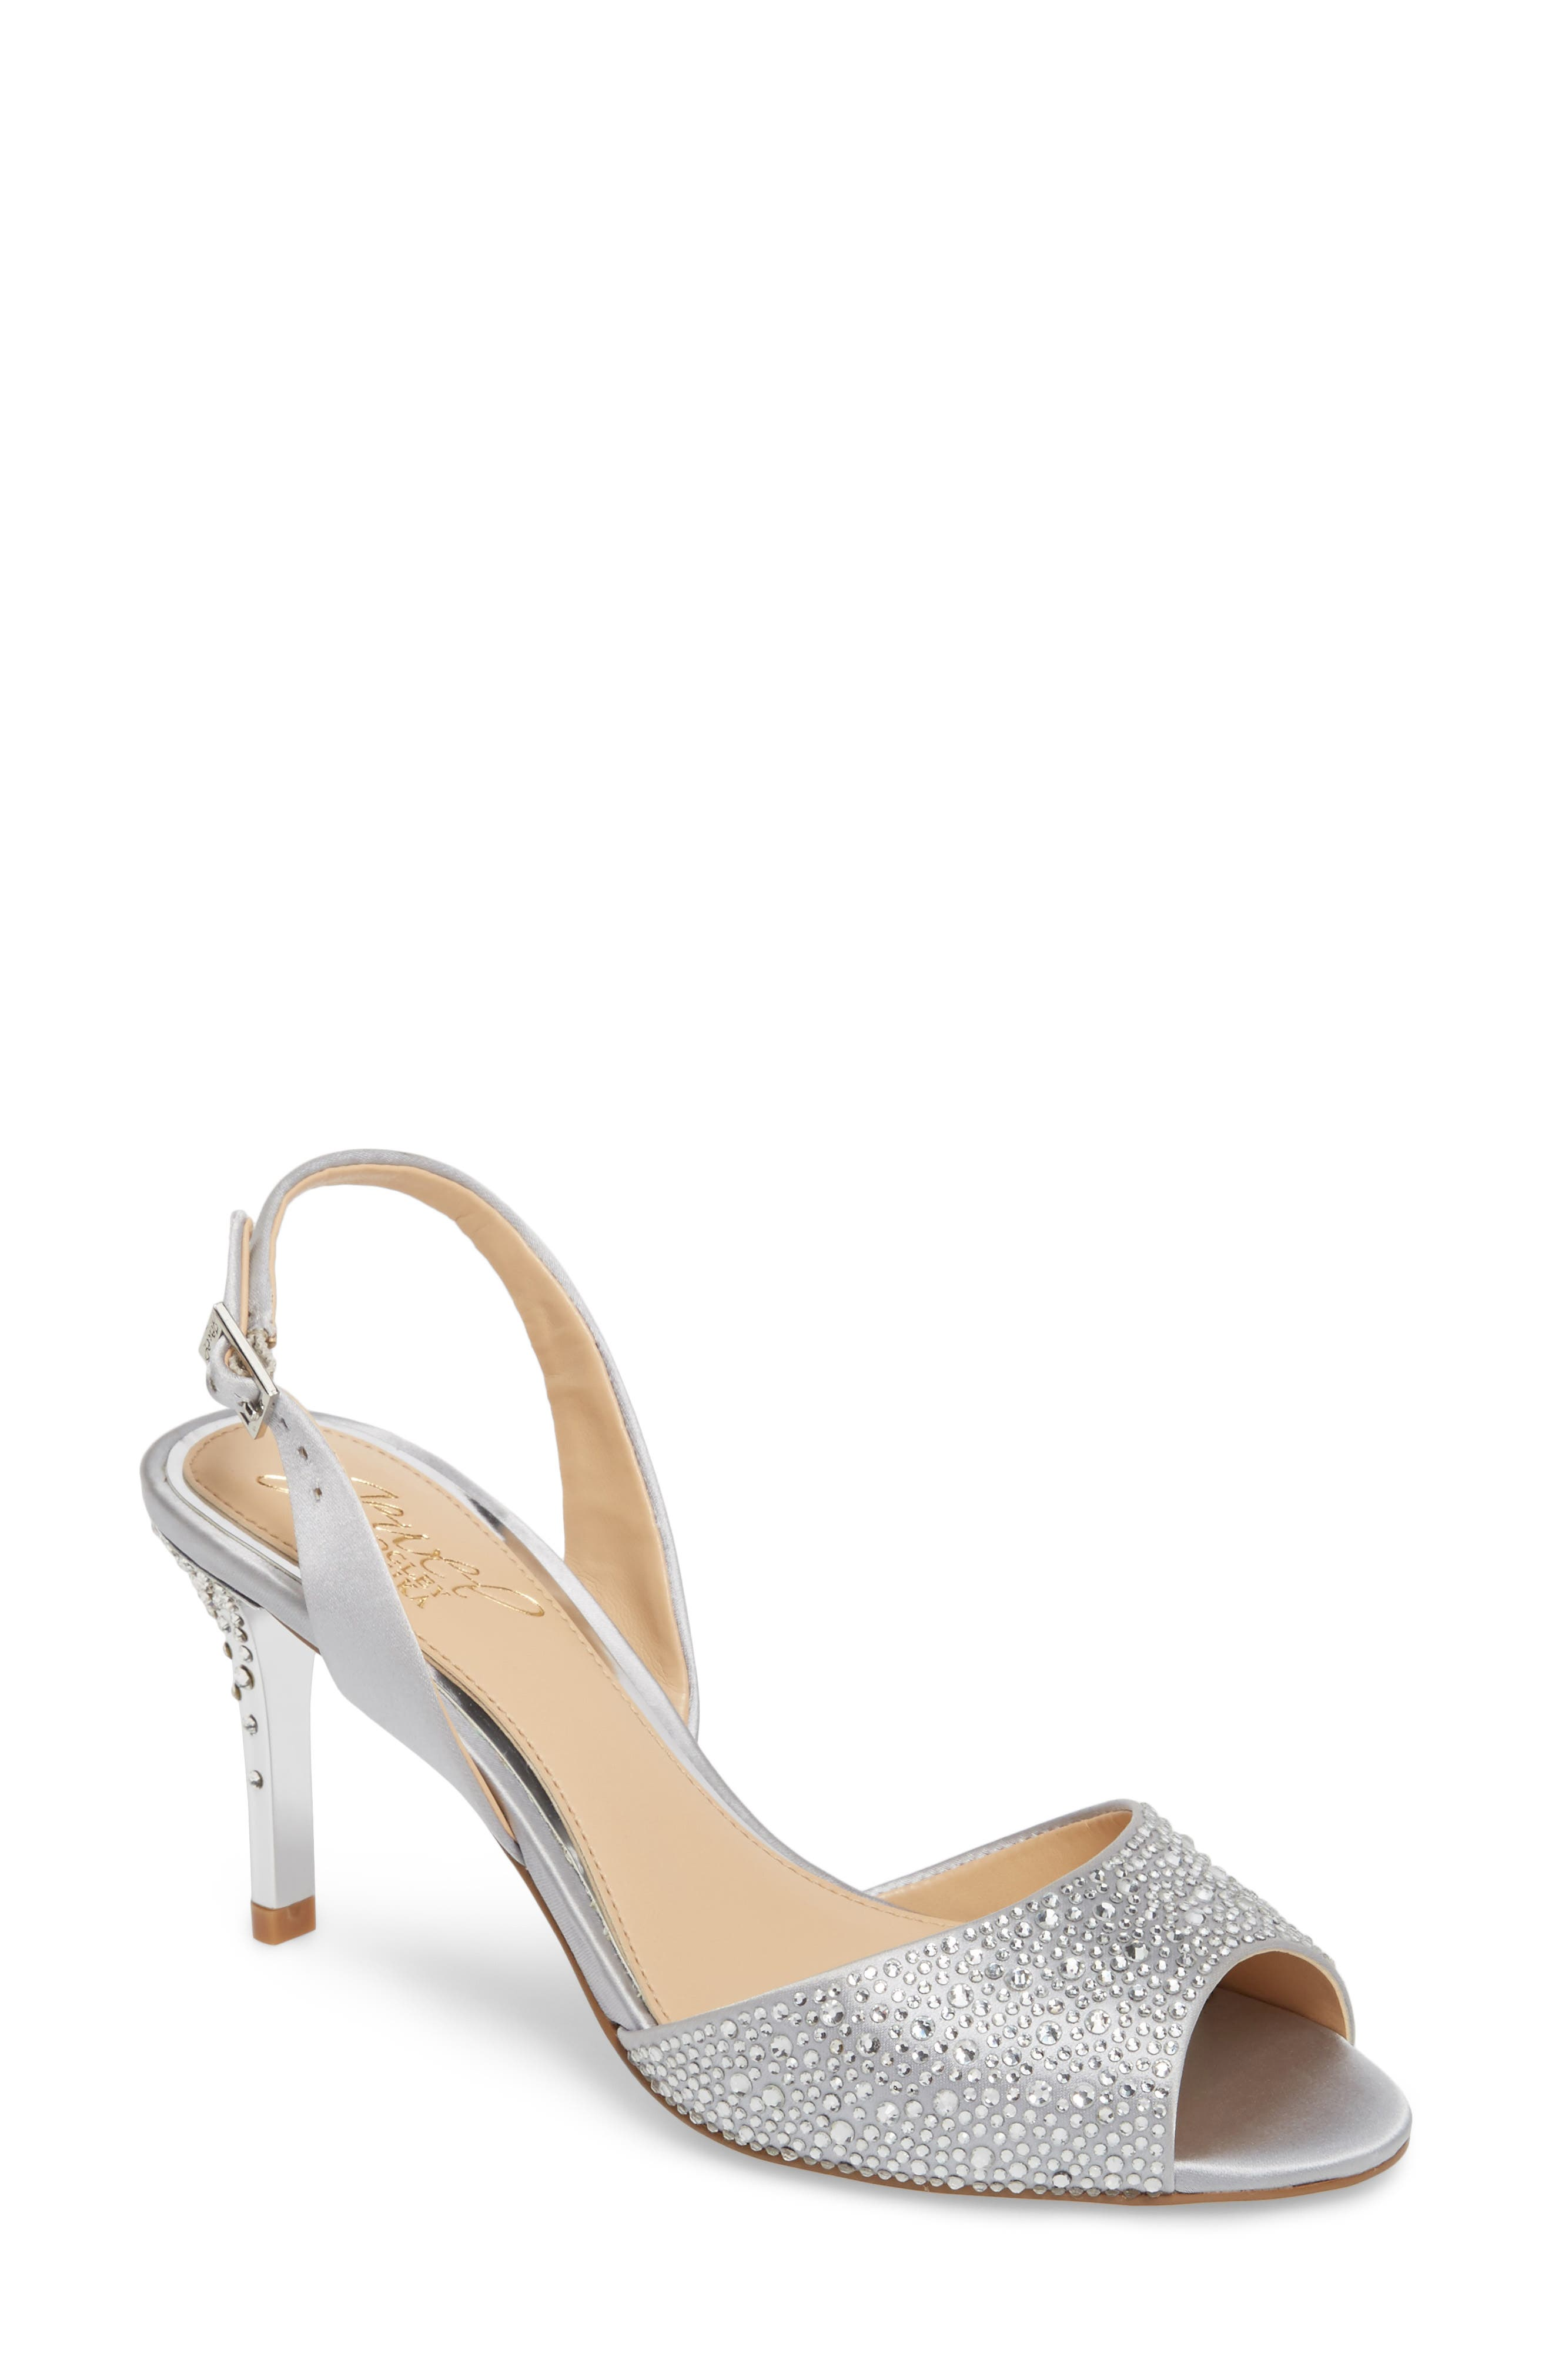 Jewel Badgley Mischka Tanner Slingback Sandal (Women)